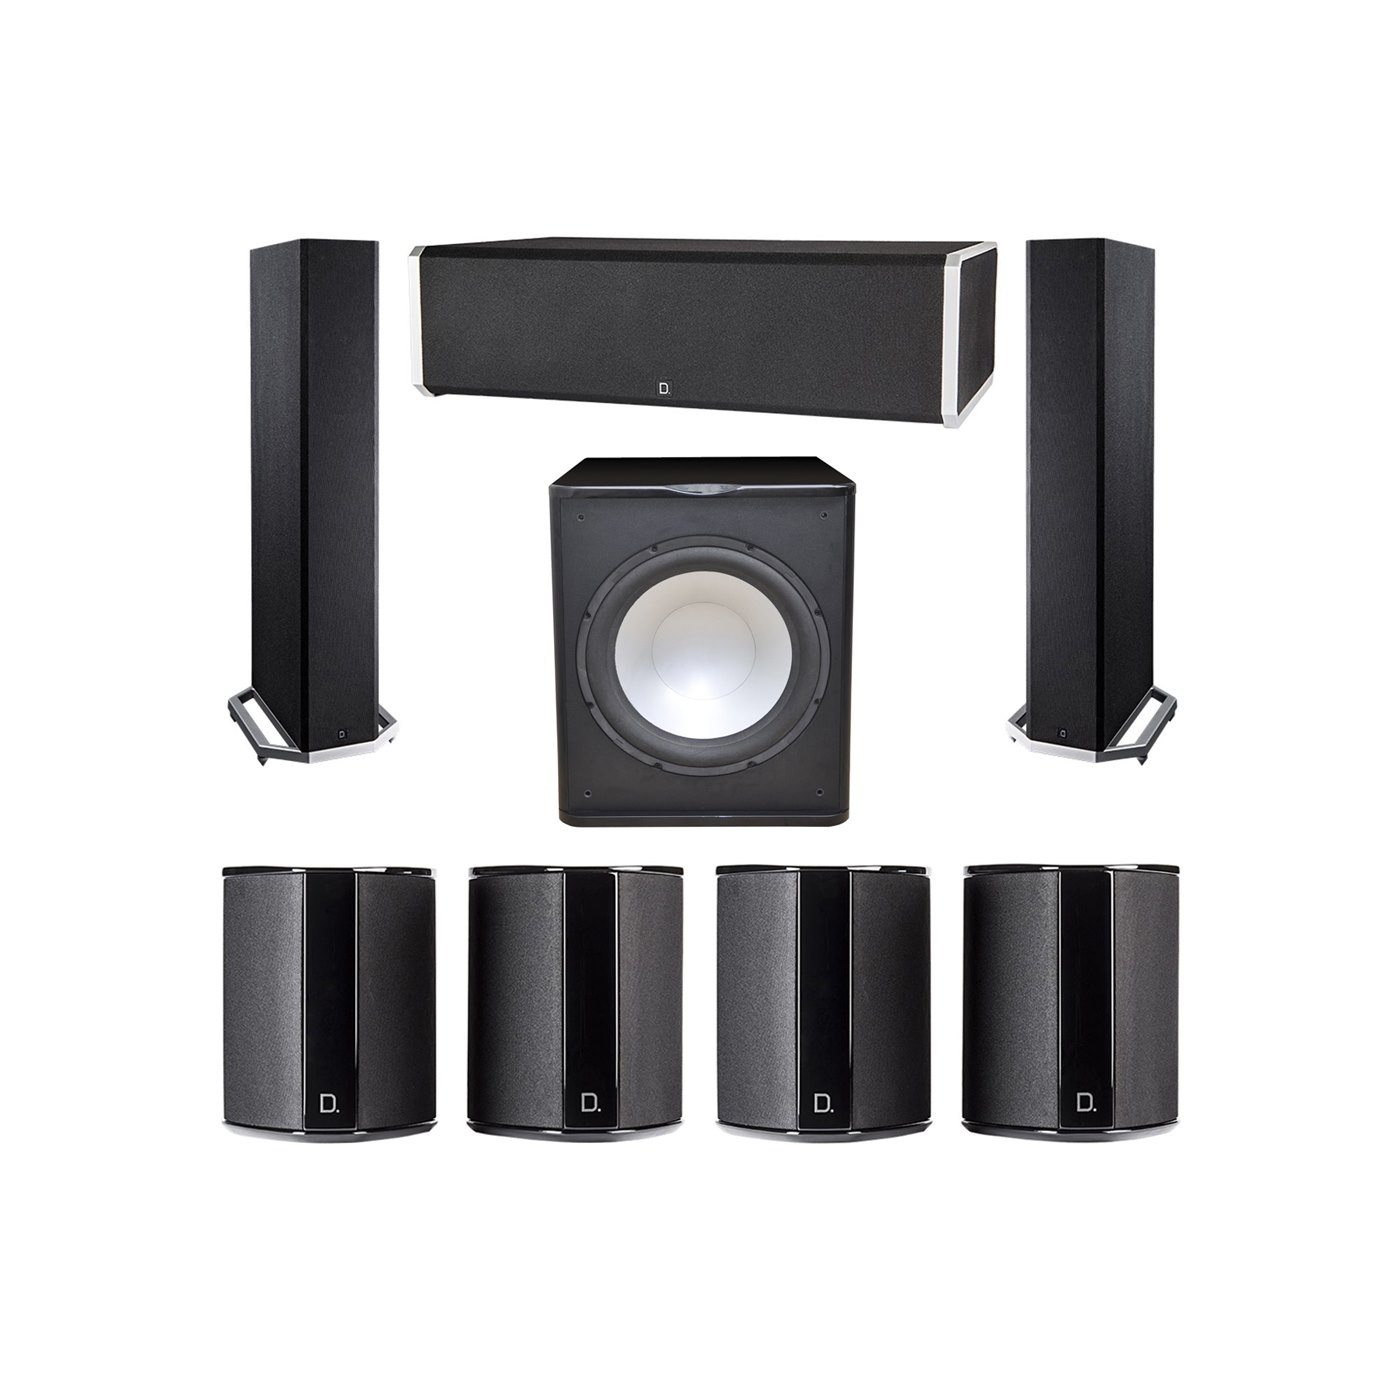 Definitive Technology 7.1 System with 2 BP9020 Tower Speakers, 1 CS9060 Center Channel Speaker, 4 SR9040 Surround Speaker, 1 Premier Acoustic PA-150 Subwoofer